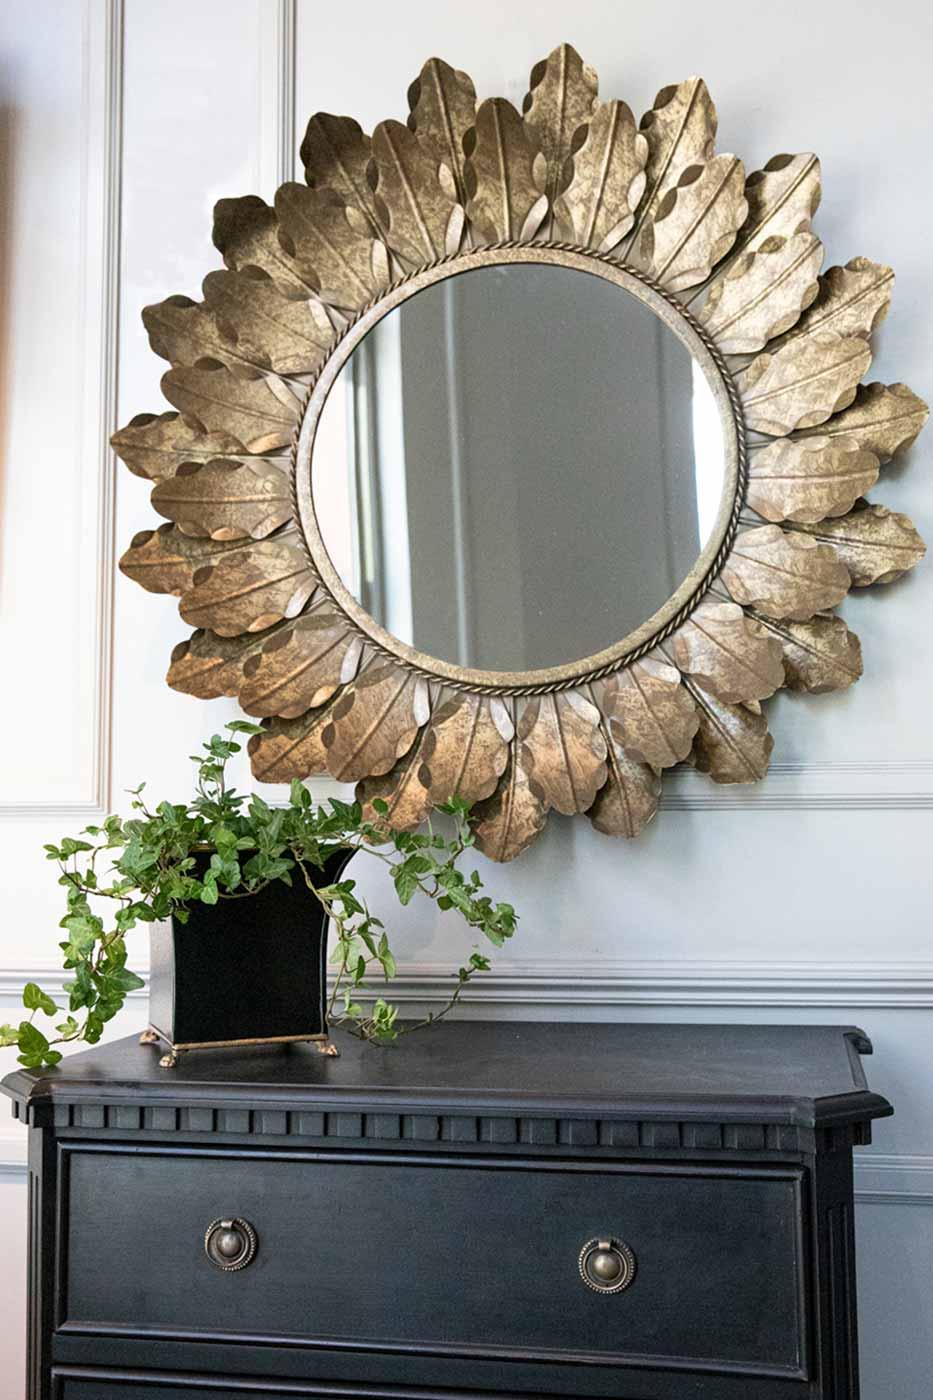 Spegel Eklöv rund 79 cm